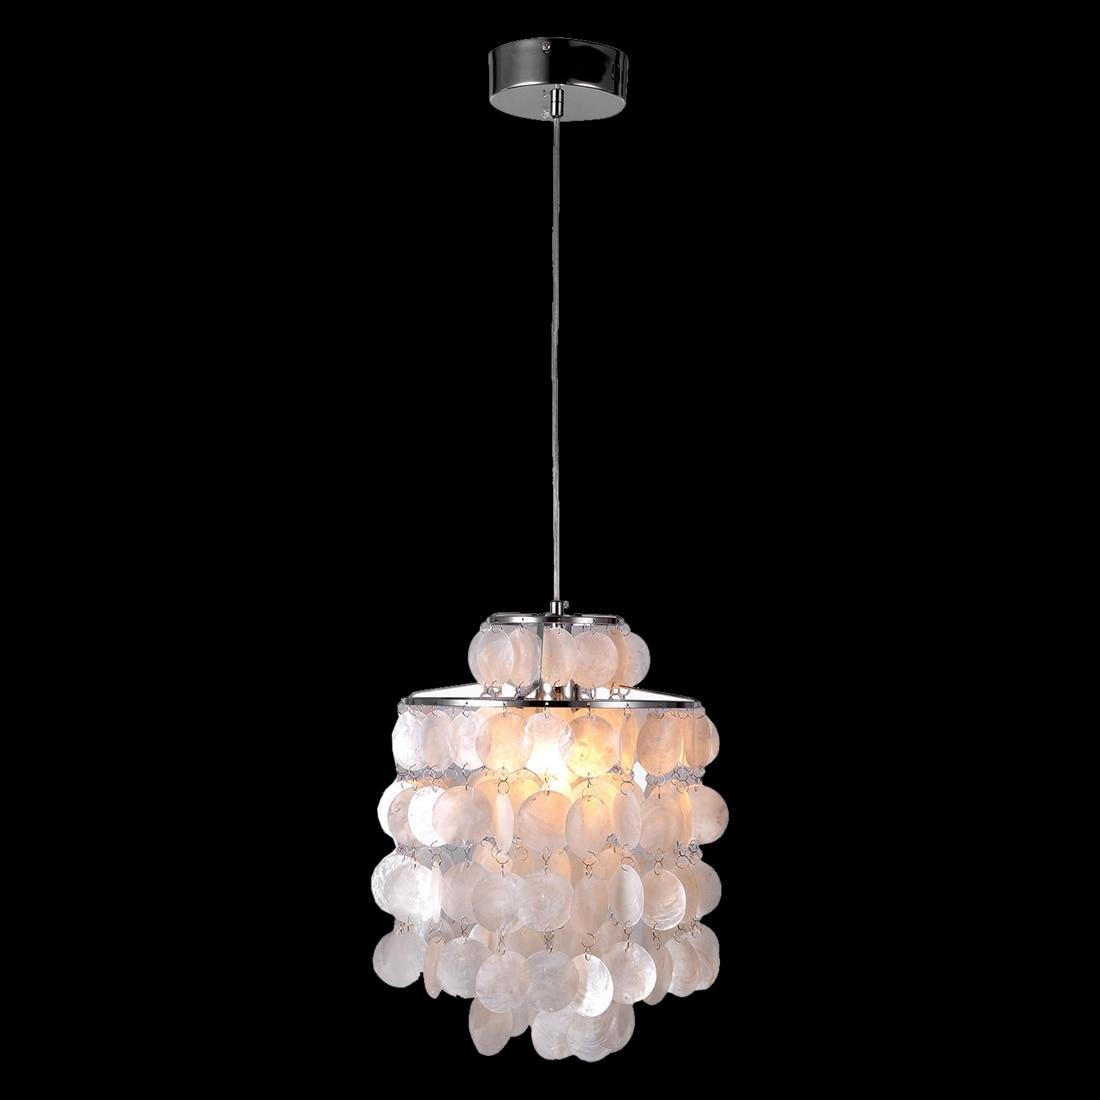 Crystal Hi5 Pendant White Shell Lamp Lamp Hallway Fixture<br><br>Aliexpress